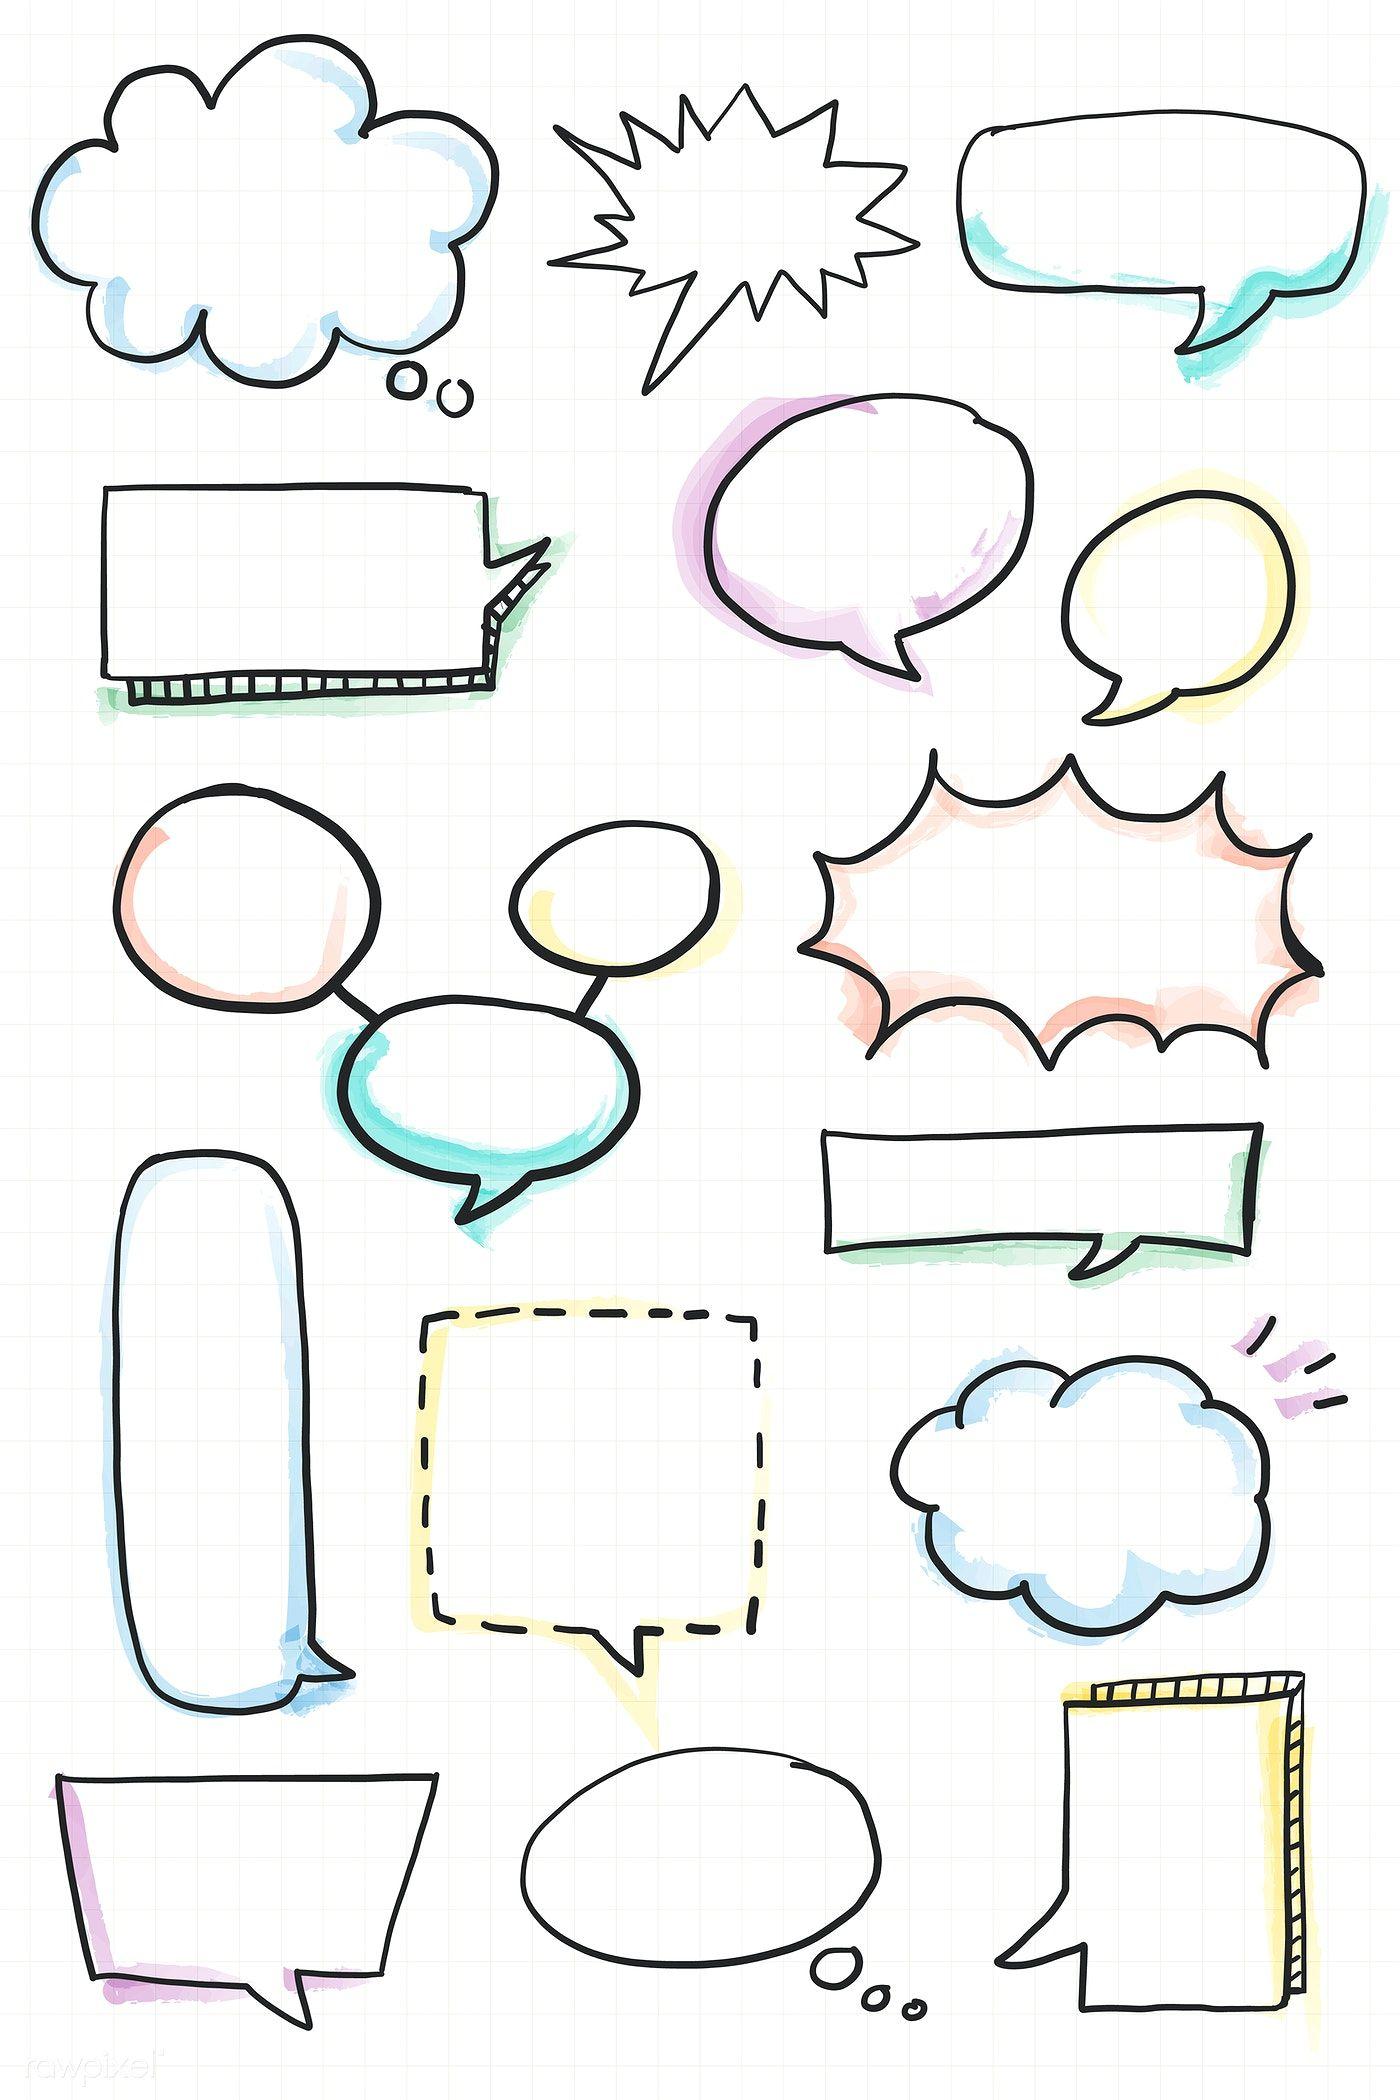 Download premium vector of Hand drawn speech bubble doodle element vector